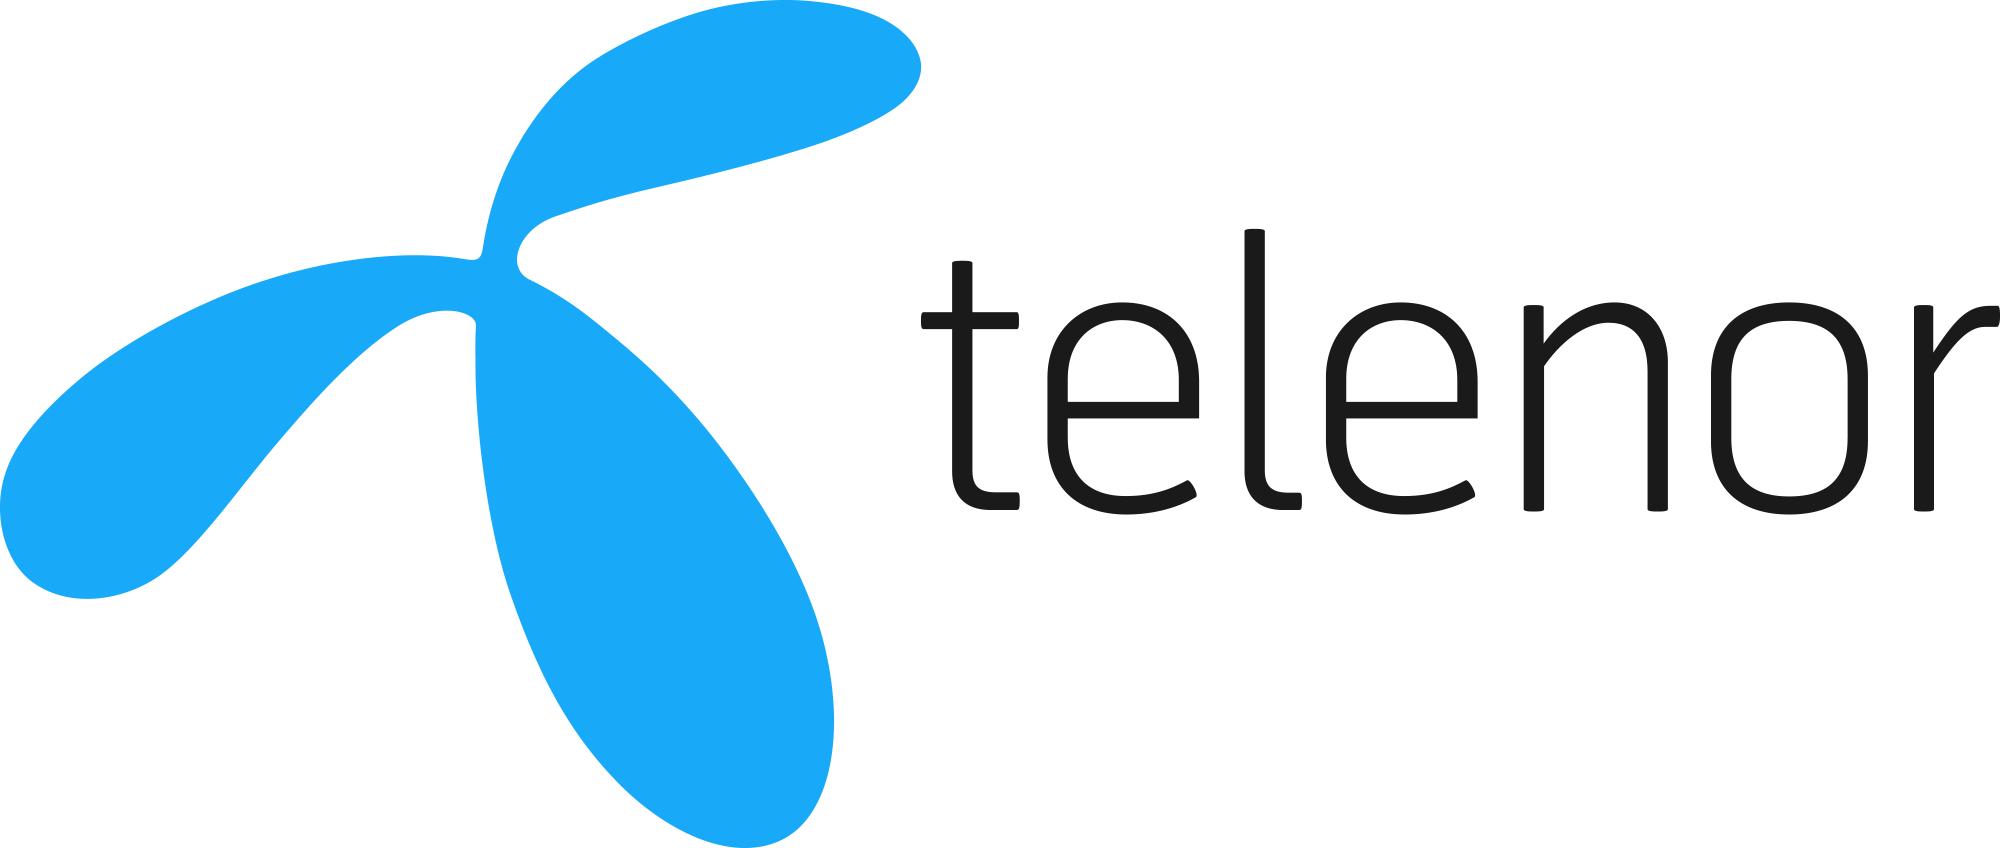 telenor_logo_big